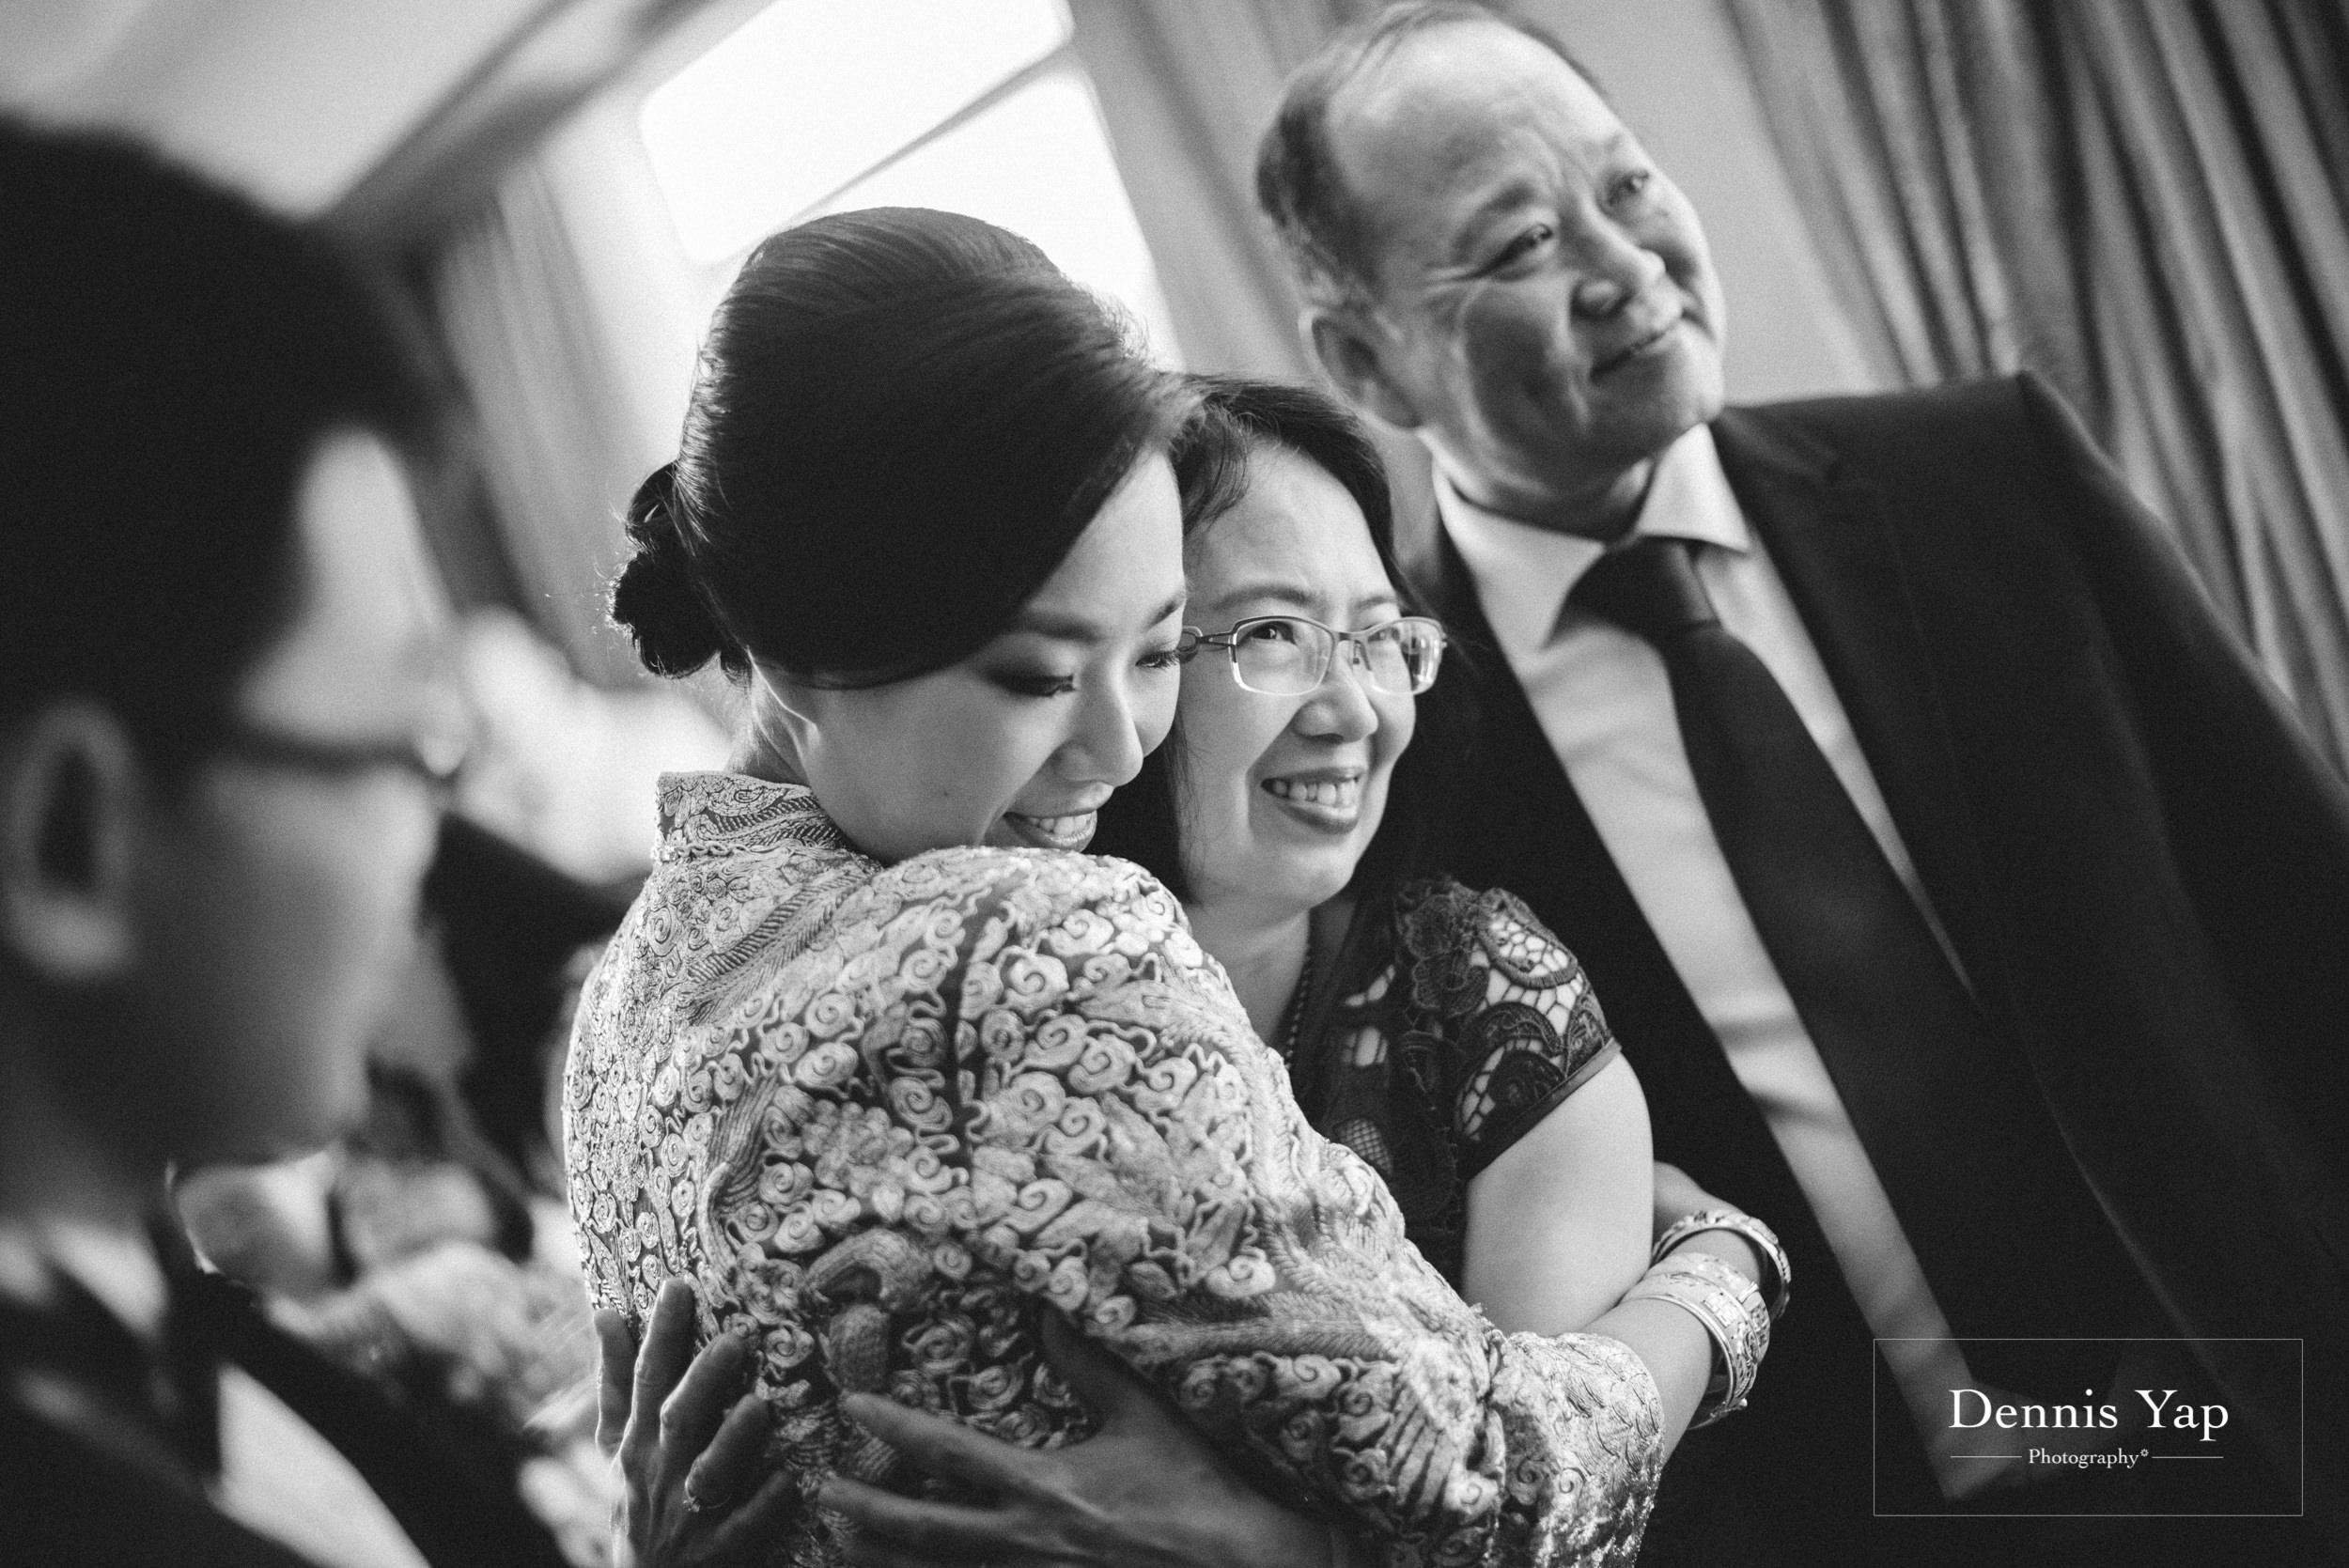 wai keong jenny wedding day bangsar dennis yap photography emotions beloved family-16.jpg